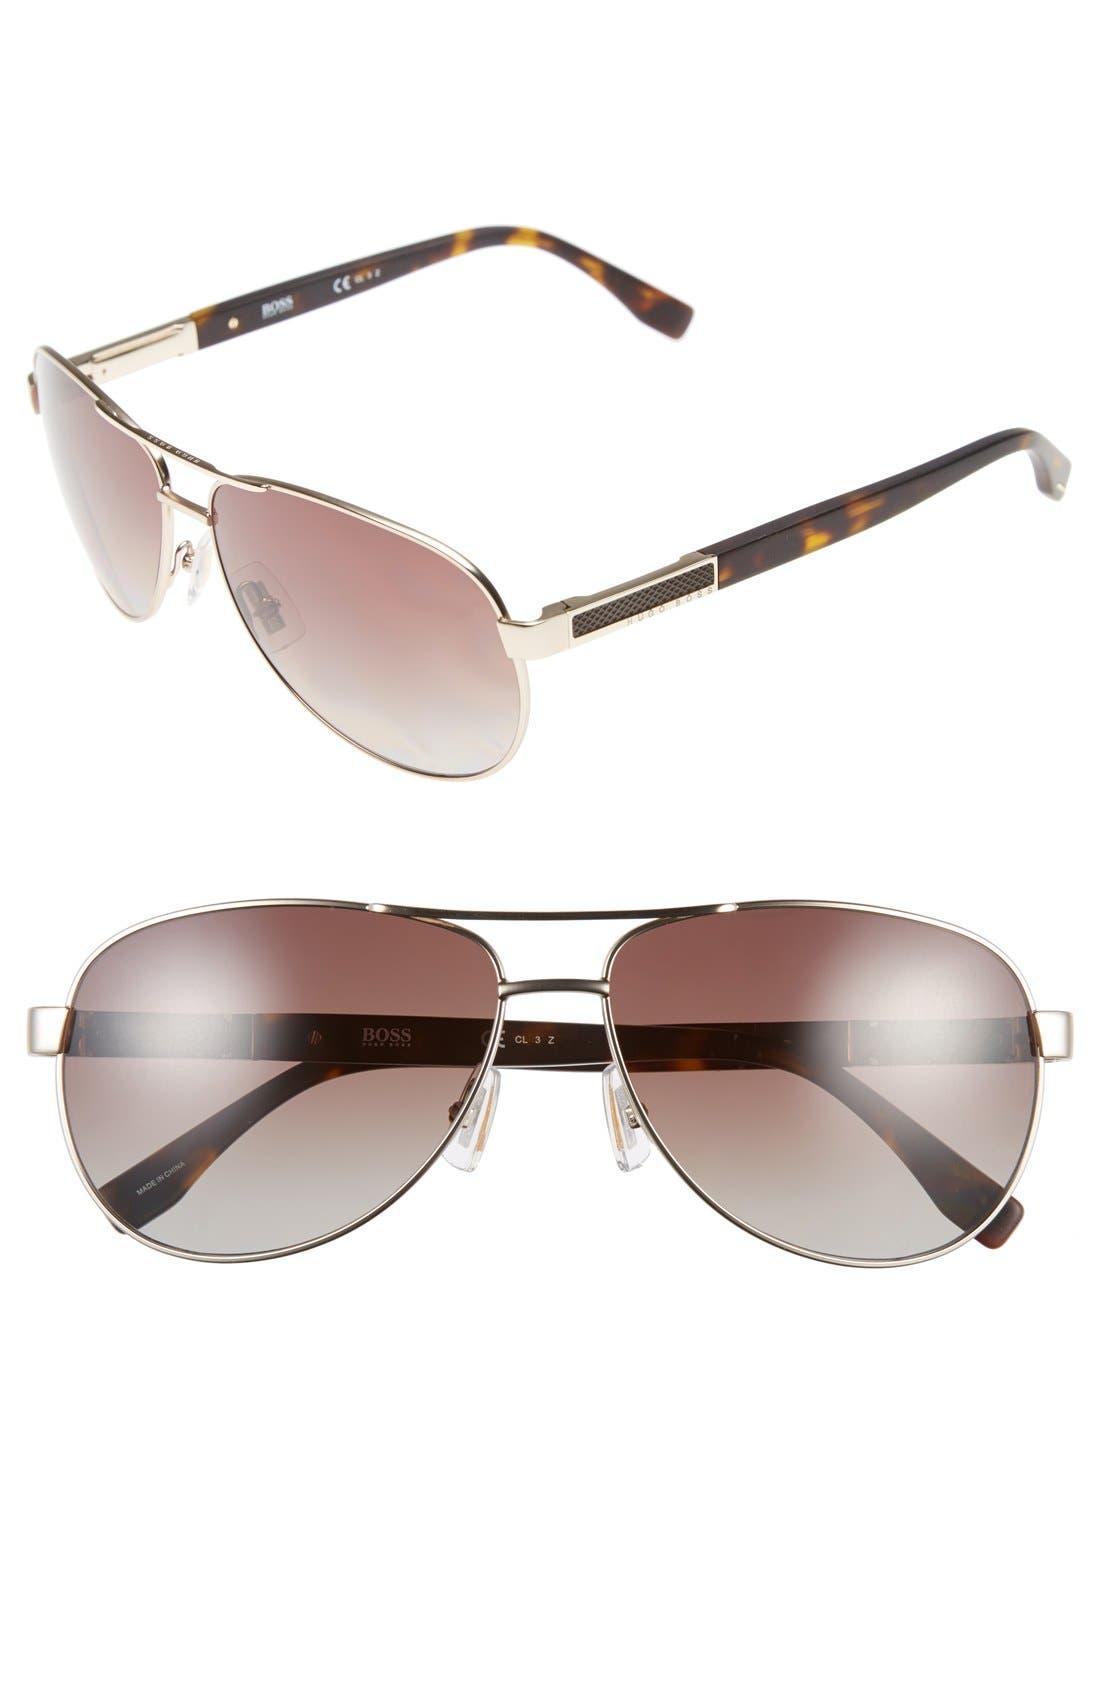 62mm Polarized Aviator Sunglasses,                         Main,                         color, Semi Matte Light Gold/ Brown